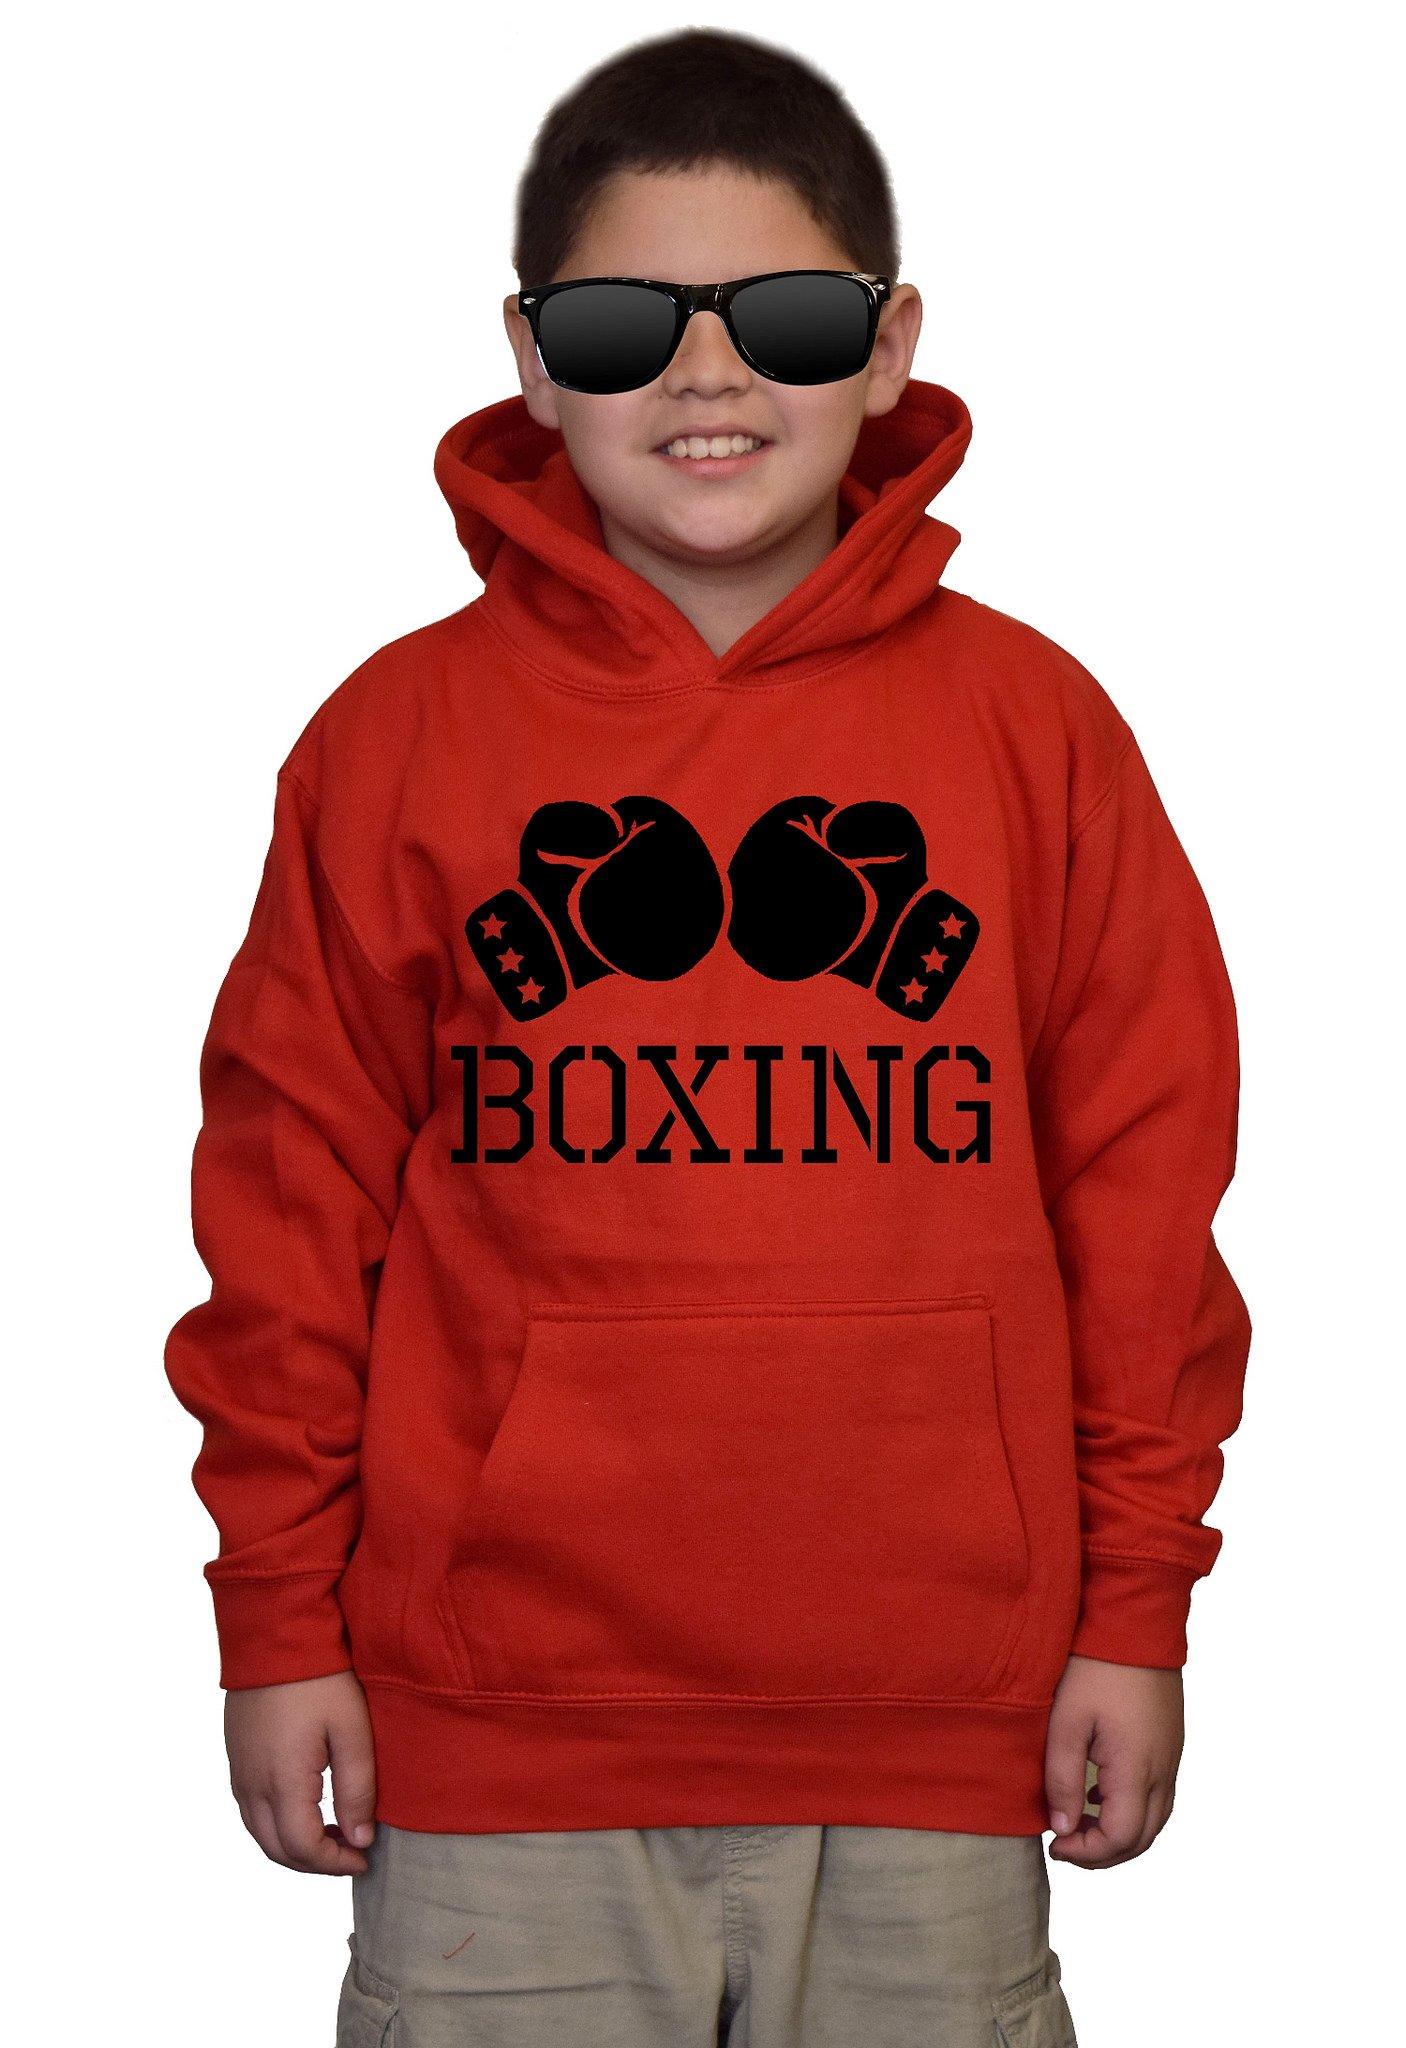 Youth Boxing Glove V434 Red kids Sweatshirt Hoodie XLarge